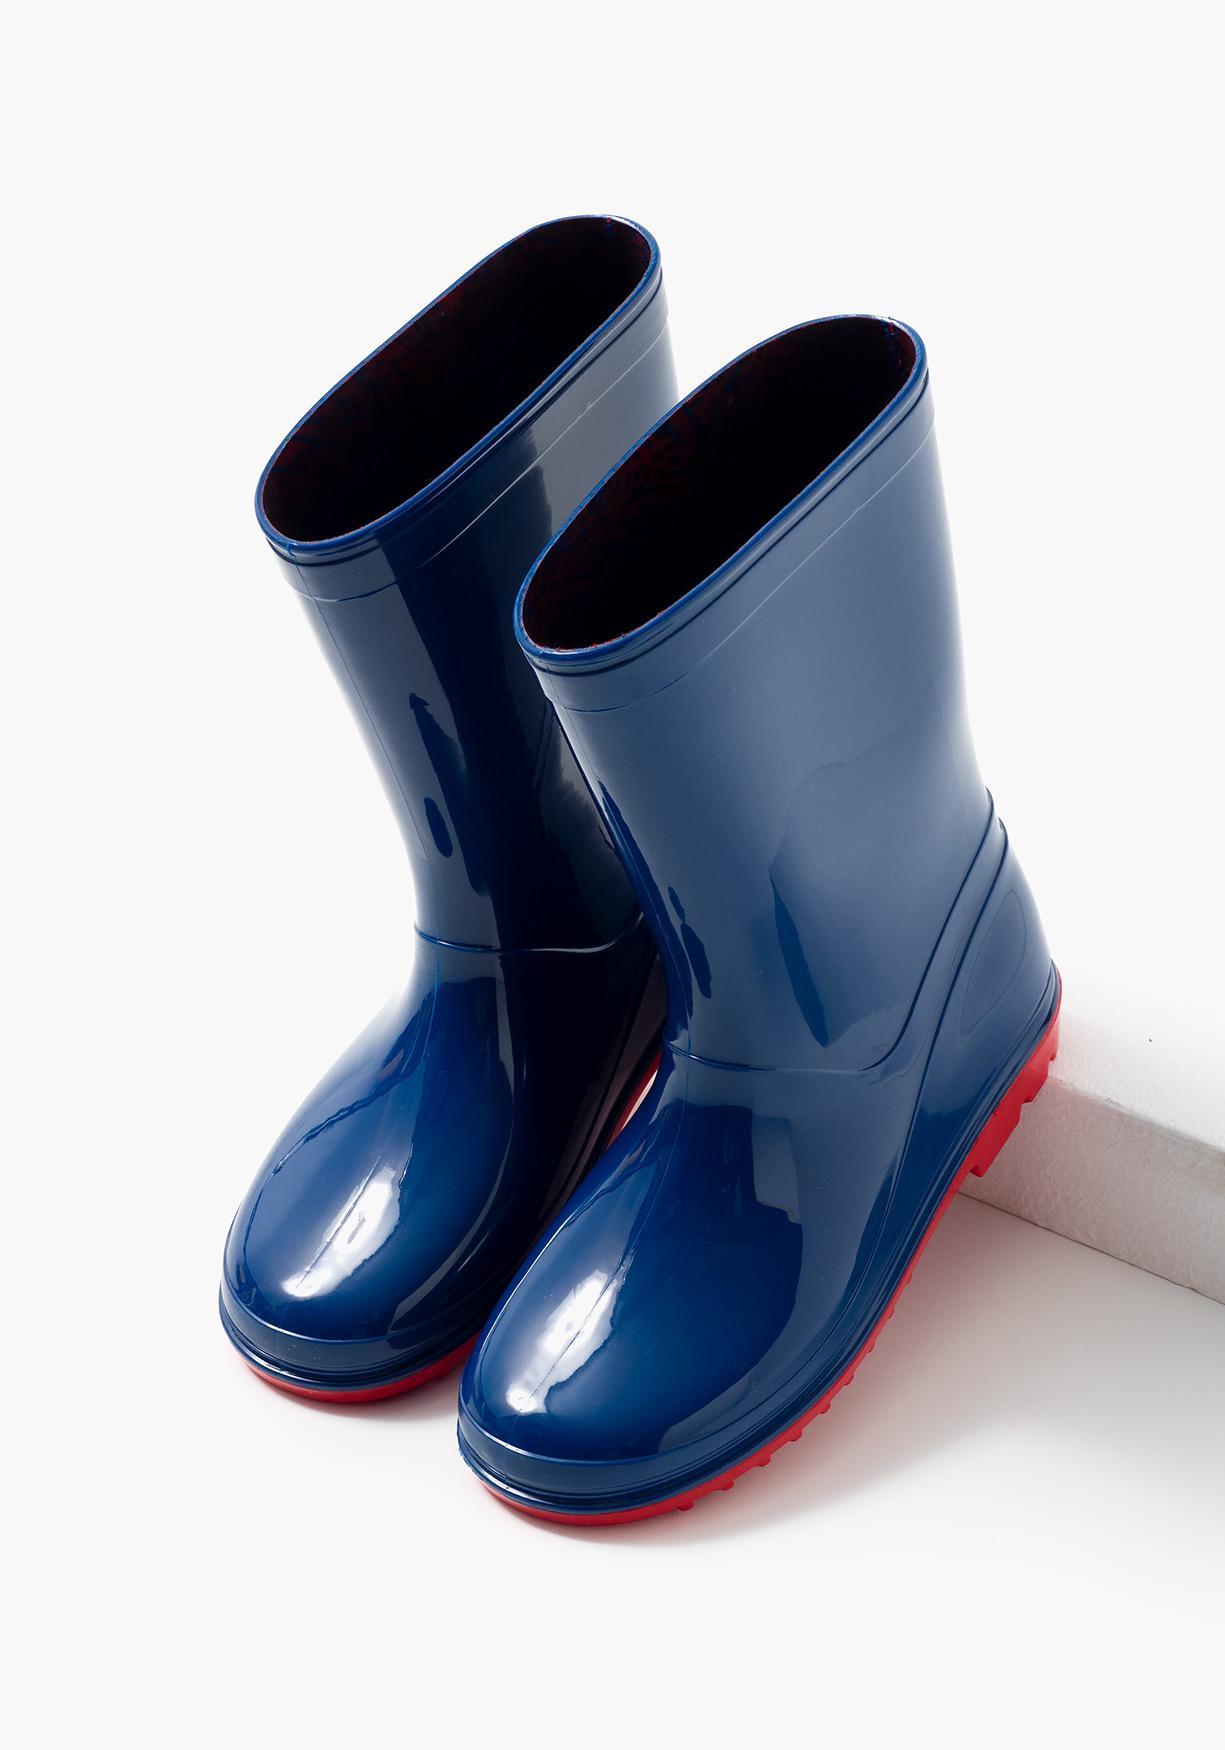 2a4ff9cfc Comprar Botas de agua unisex TEX (Tallas 28 a 34). ¡Aprovéchate de ...